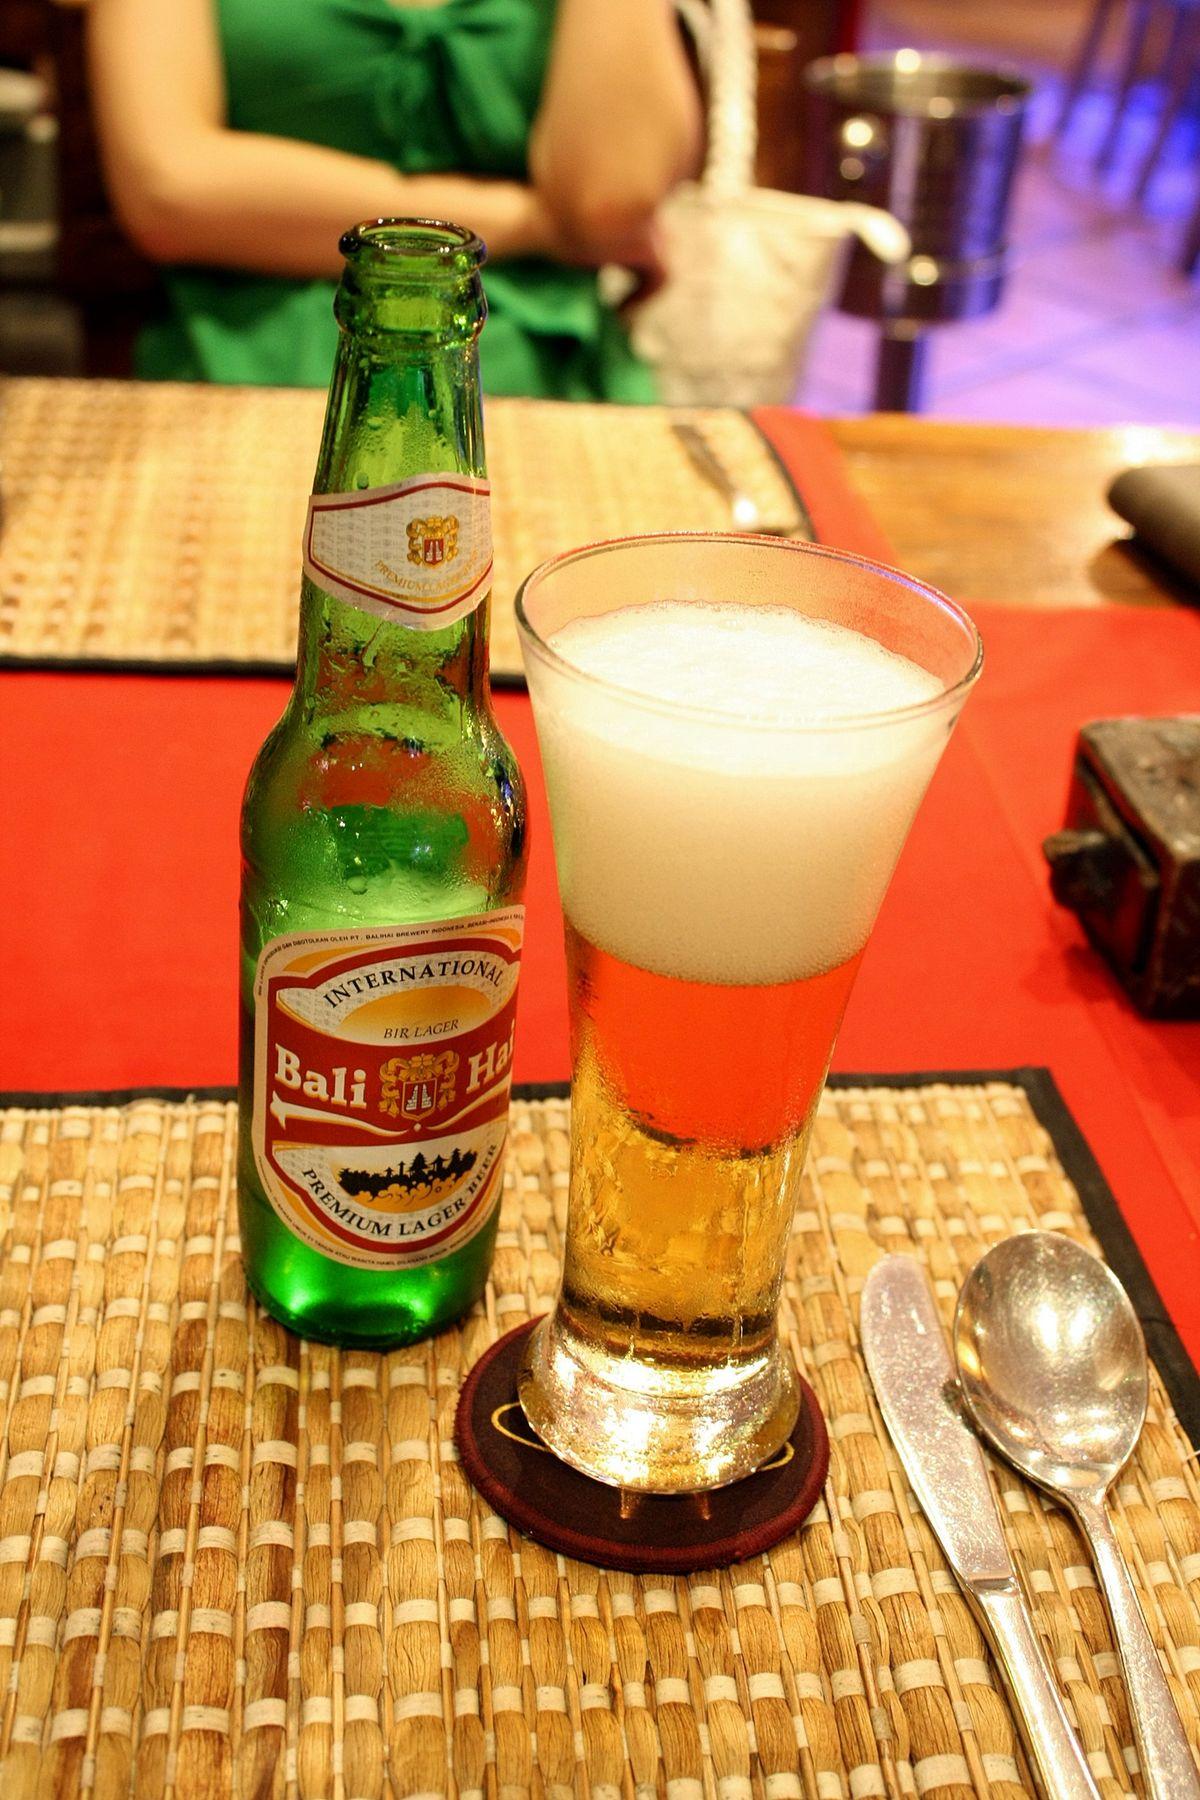 Bali_Hai_beer.jpg